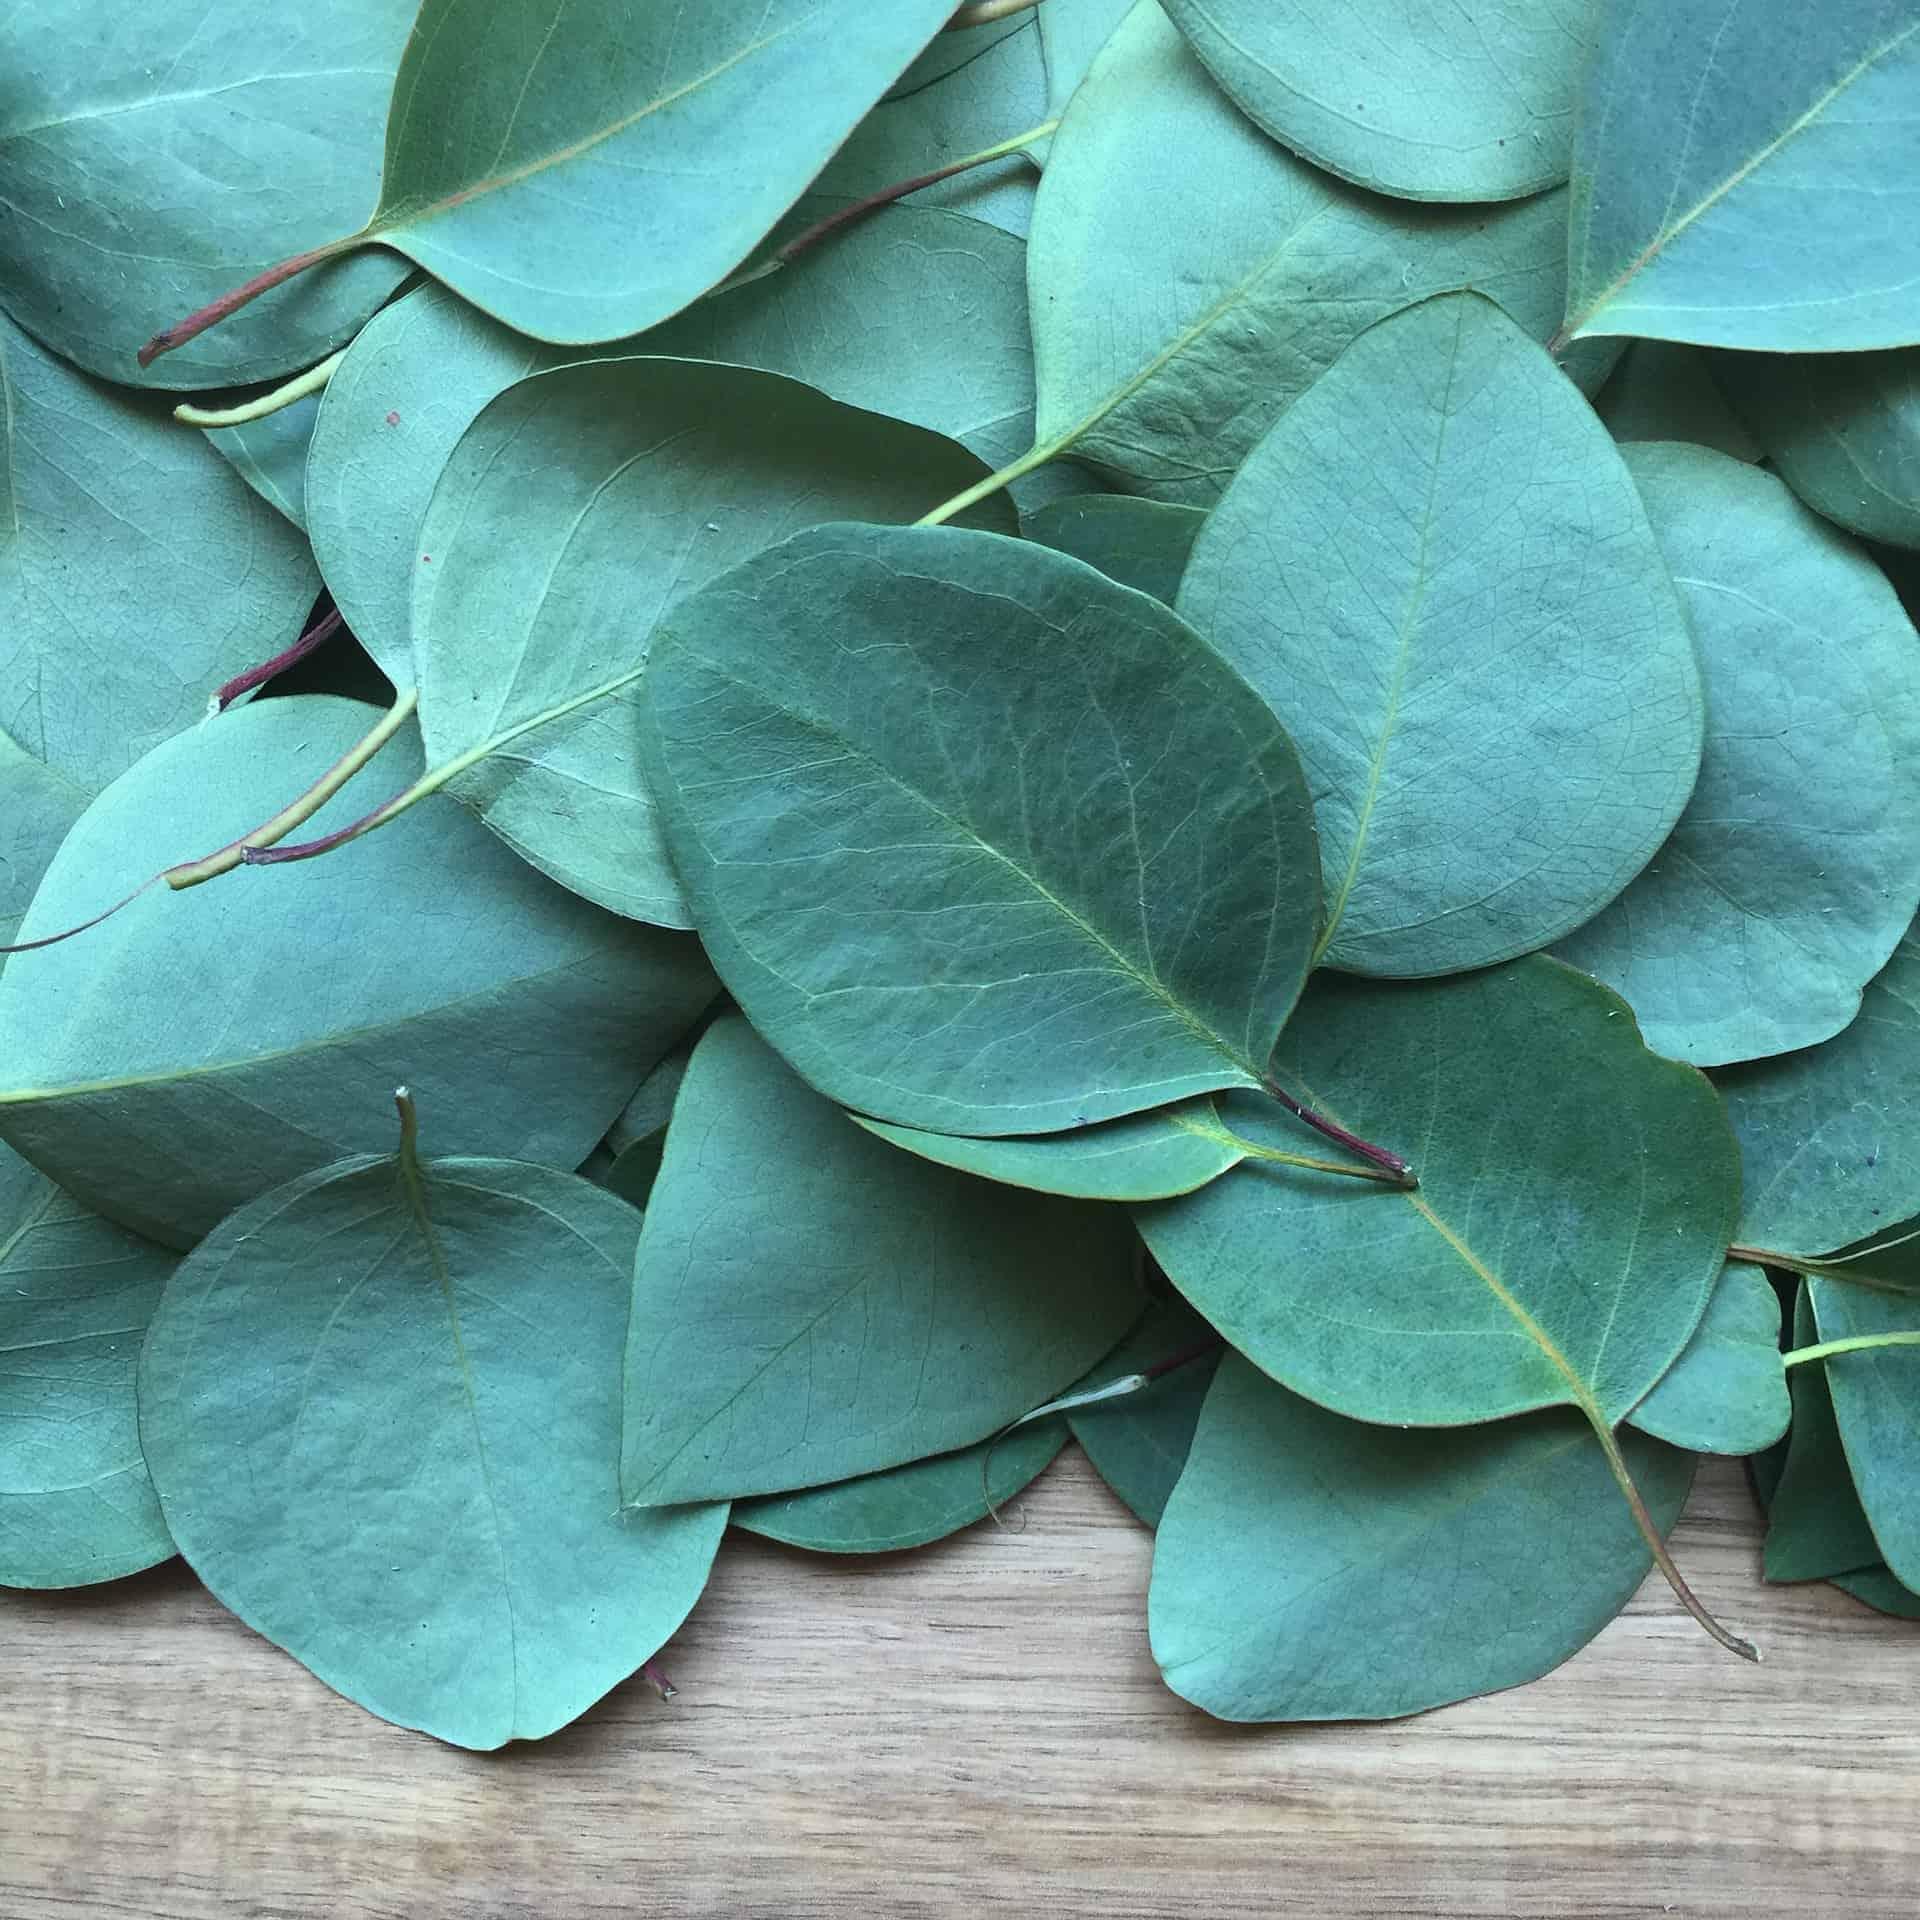 8 Health Benefits of Eucalyptus